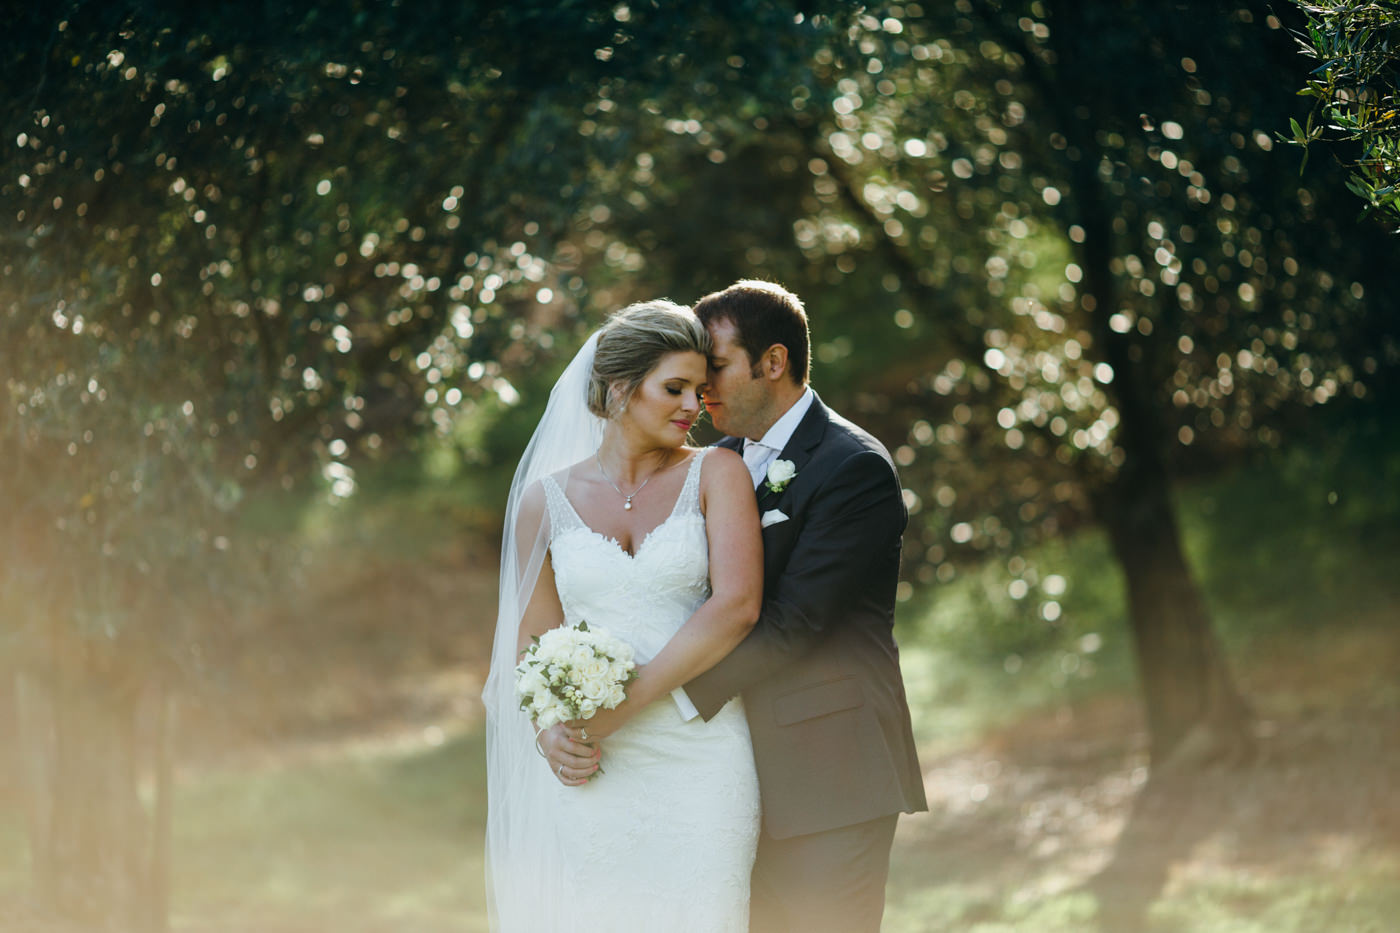 bracu_wedding_photos1057.jpg